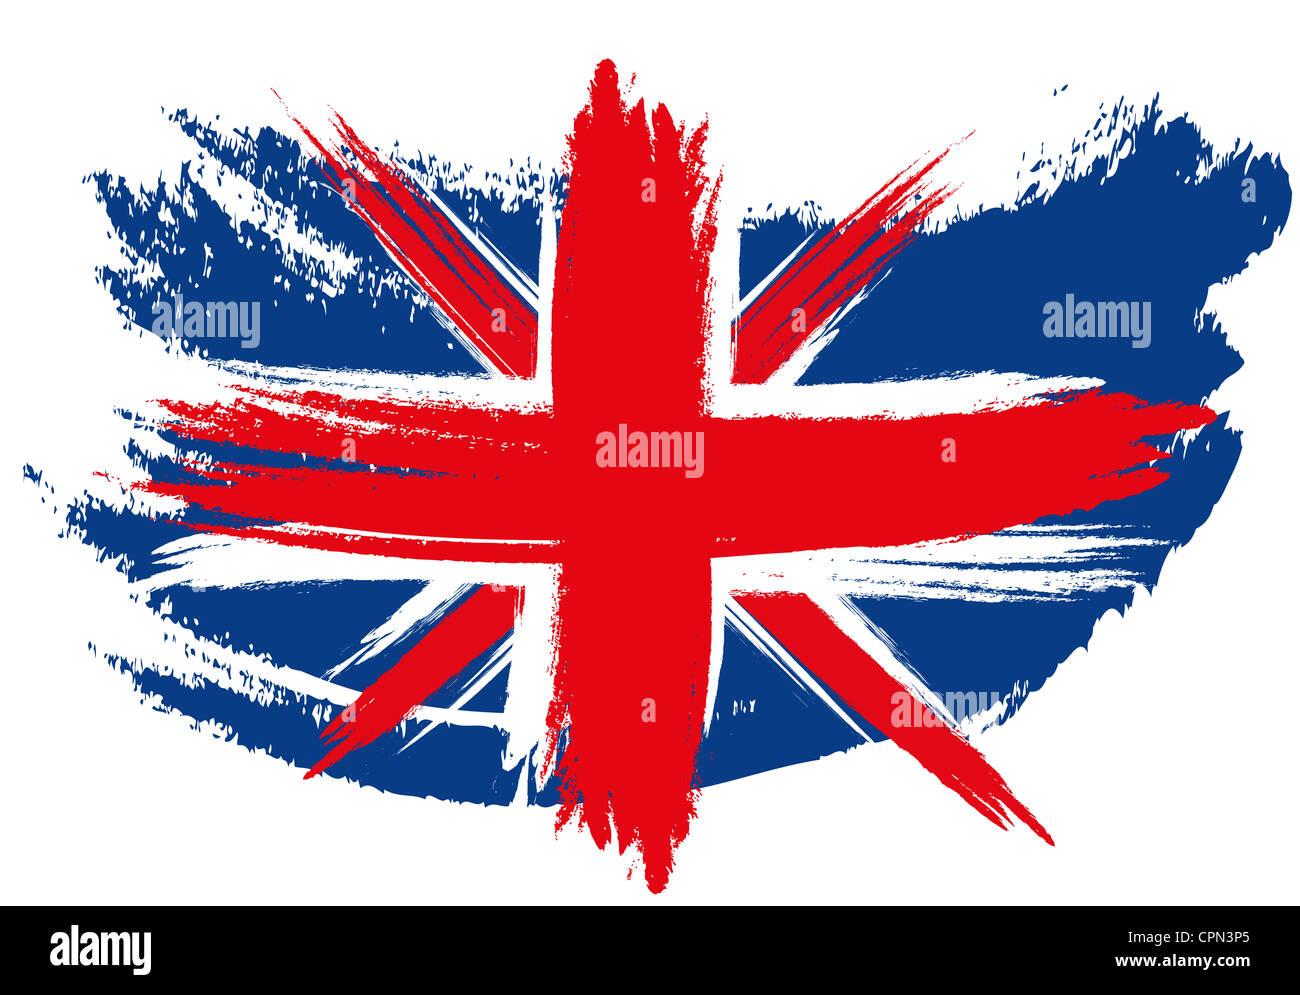 Reino Unido Gb Gran Bretaña Bandera Union Jack Dibujópintado